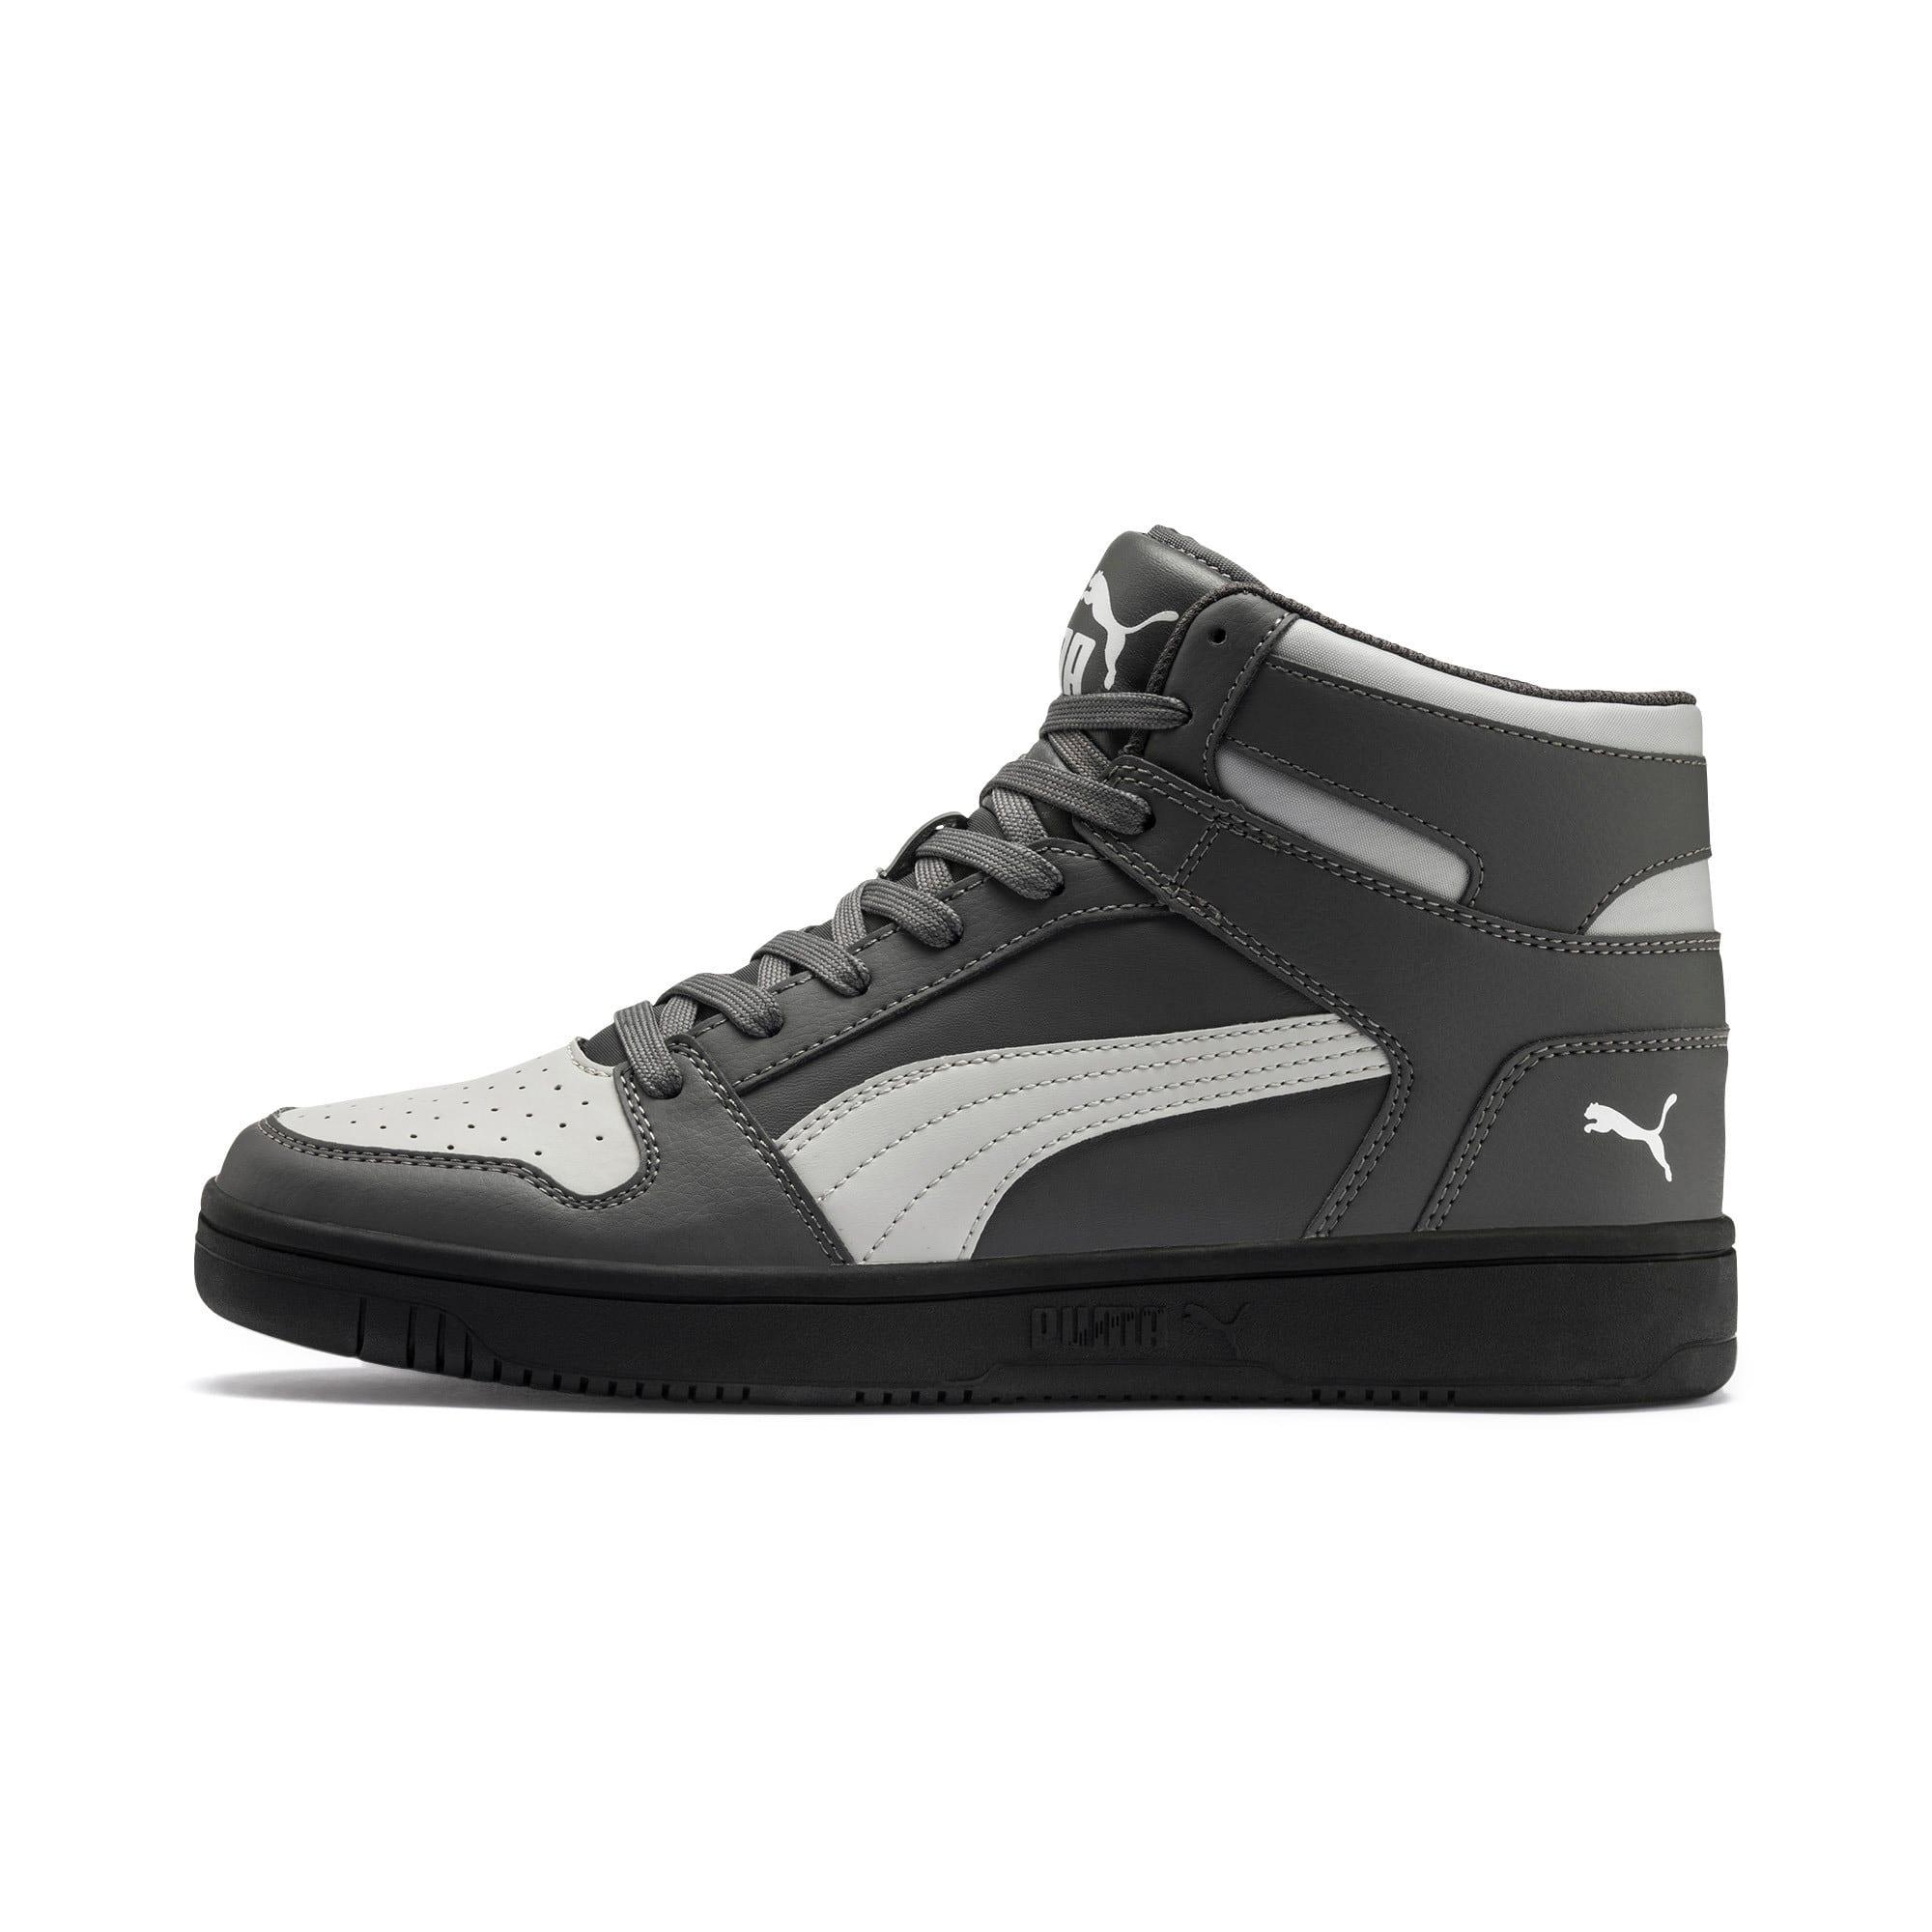 Thumbnail 1 of PUMA Rebound LayUp Sneakers, CASTLEROCK-HRise-White-Black, medium